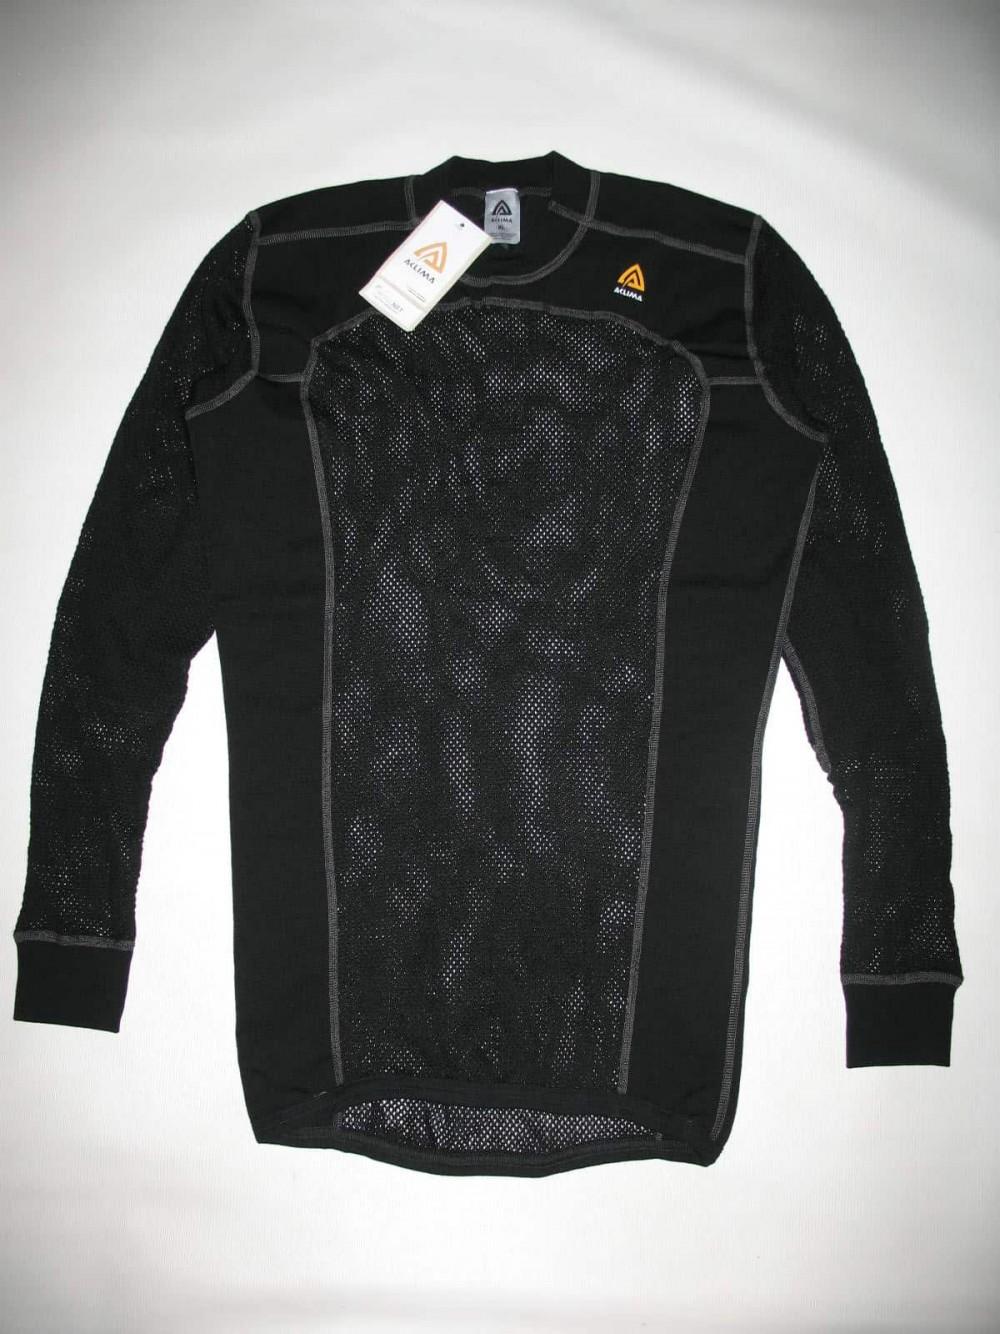 Термобелье ACLIMA 120G soft merino wool jersey (размер XL) - 3